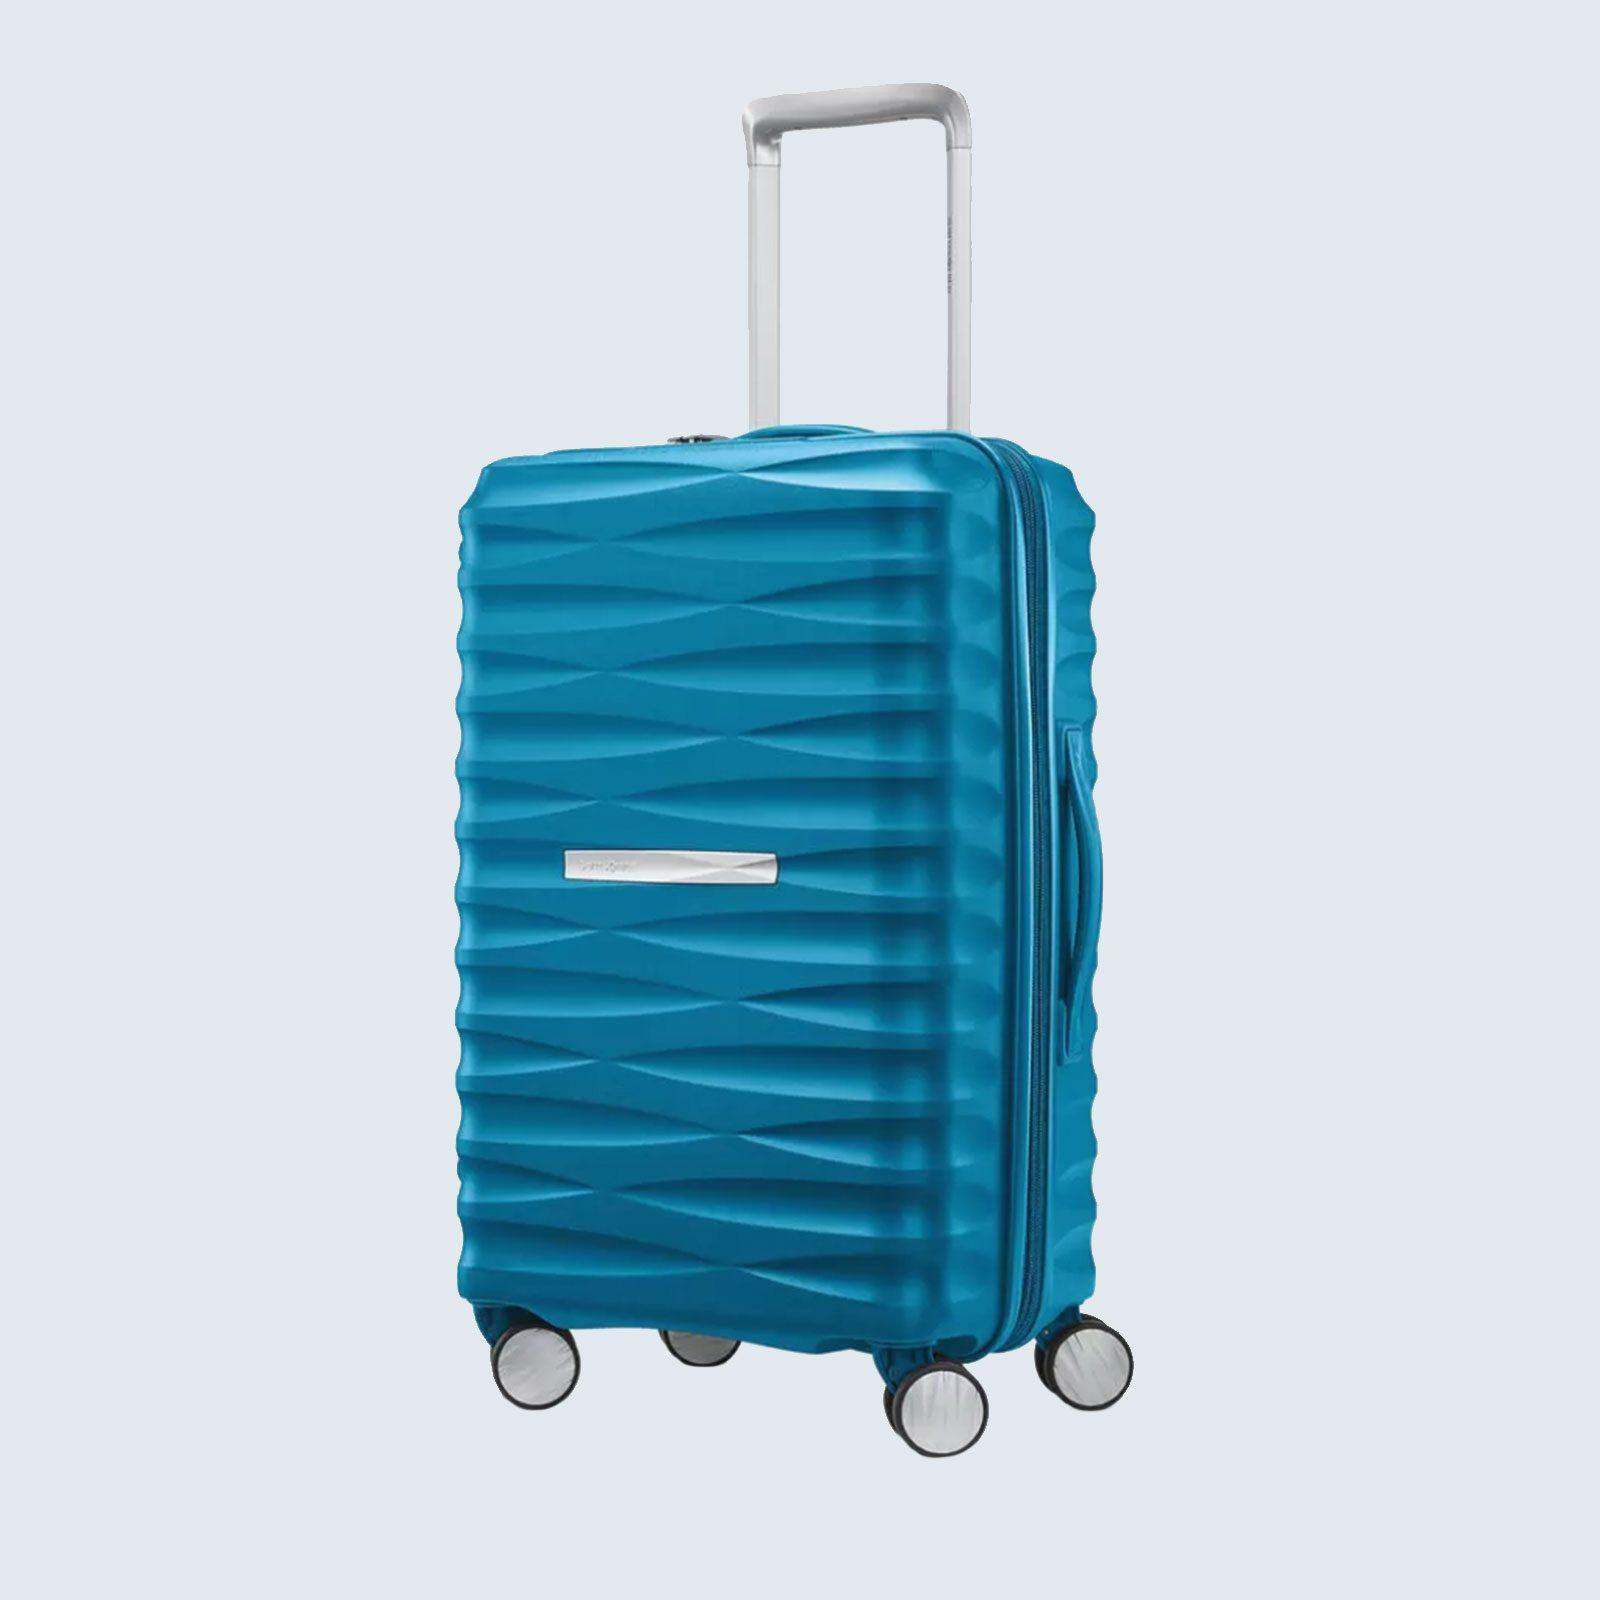 Luggage: Samsonite Voltage DLX Carry-On Spinner